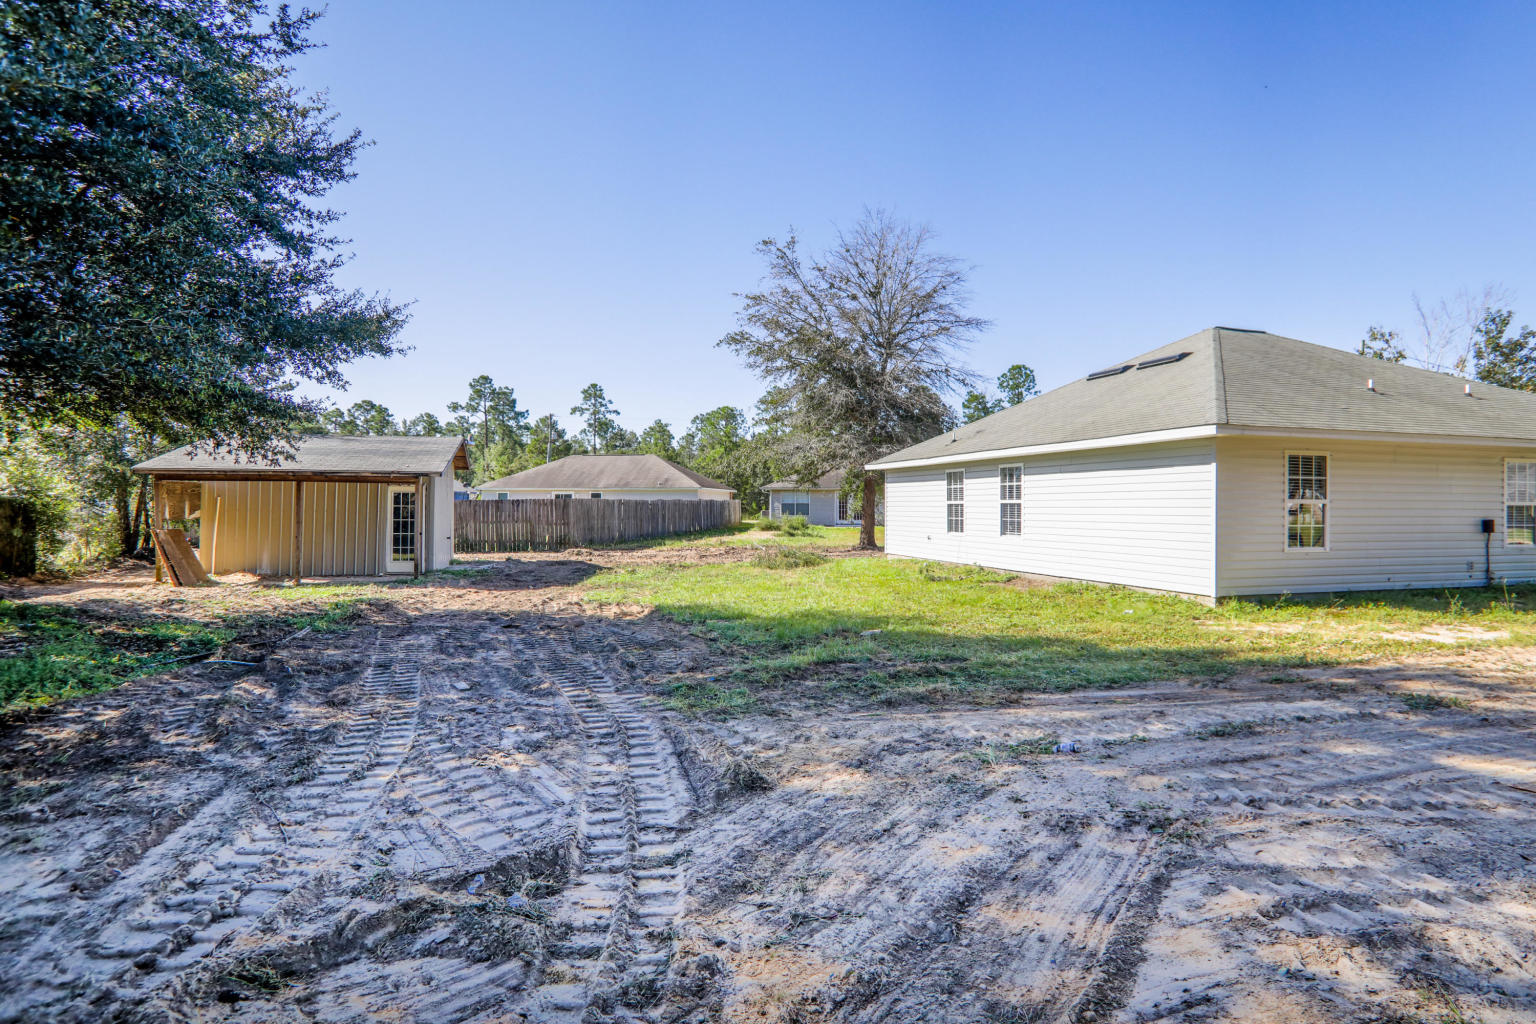 Photo of home for sale at 5185 Azalea, Crestview FL